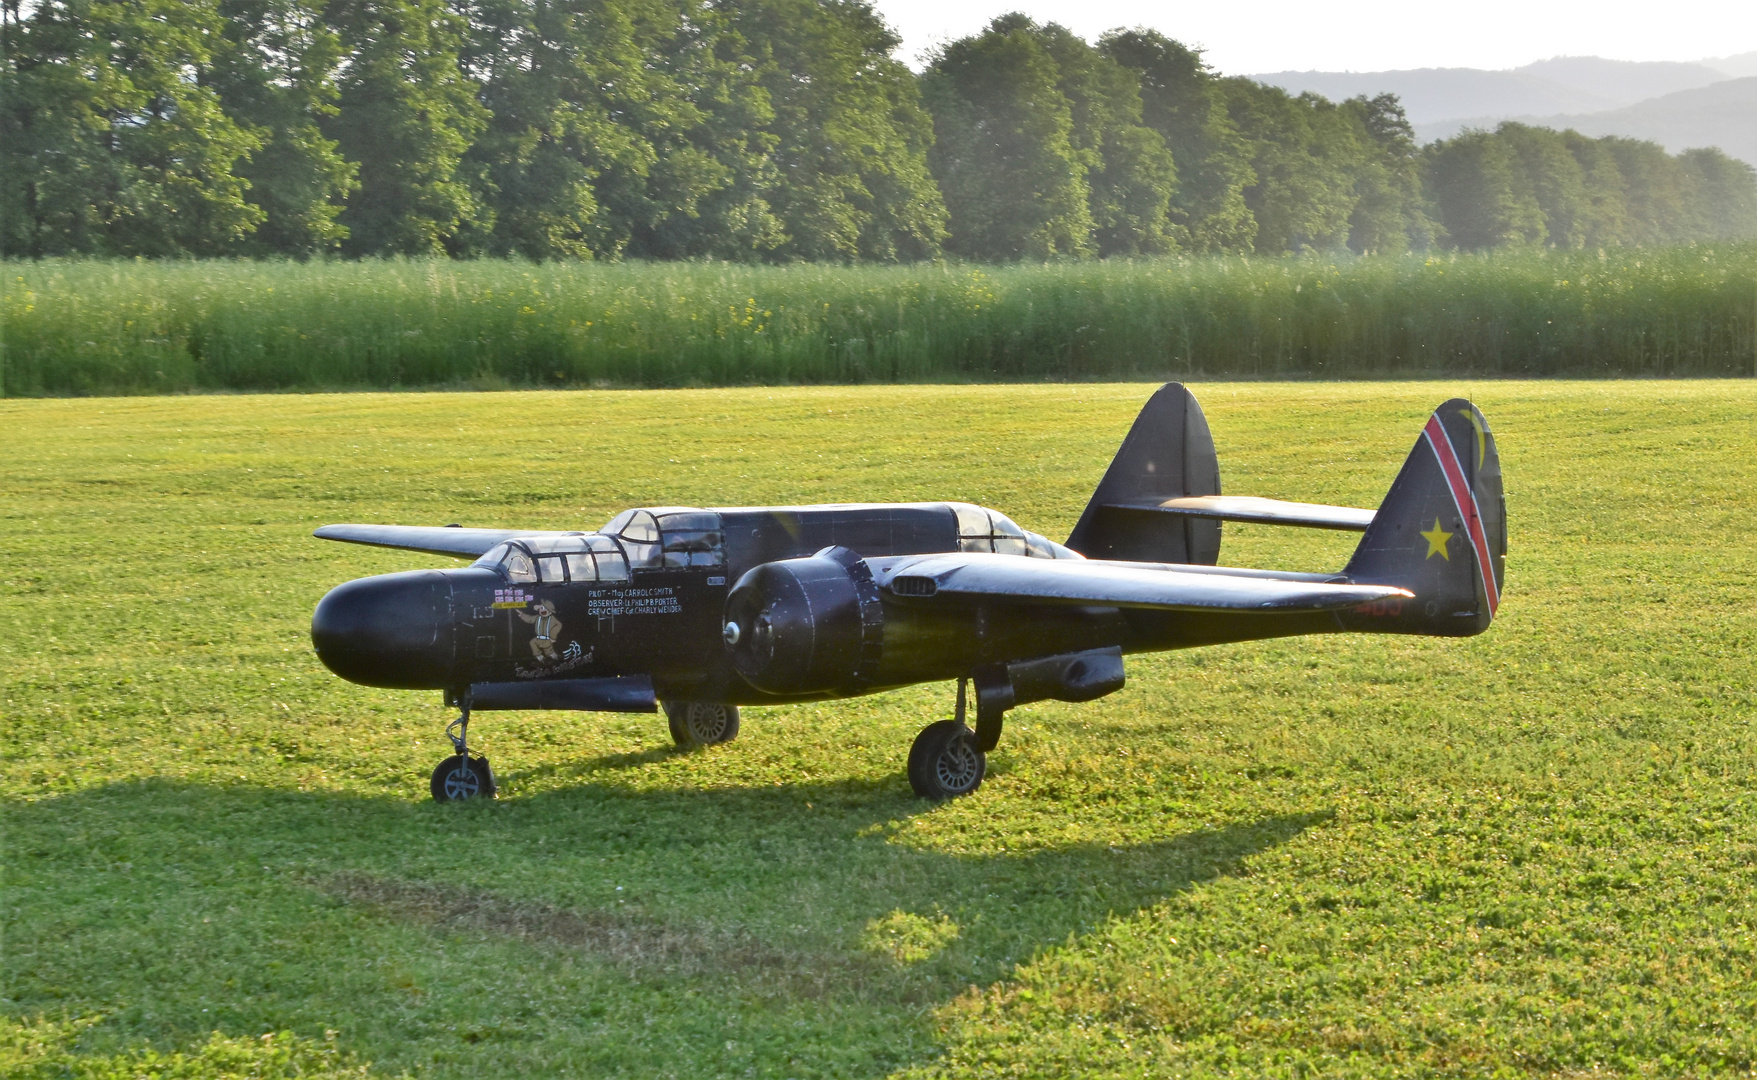 Northrop P-61B Black Widow - USA - Air Force | Aviation